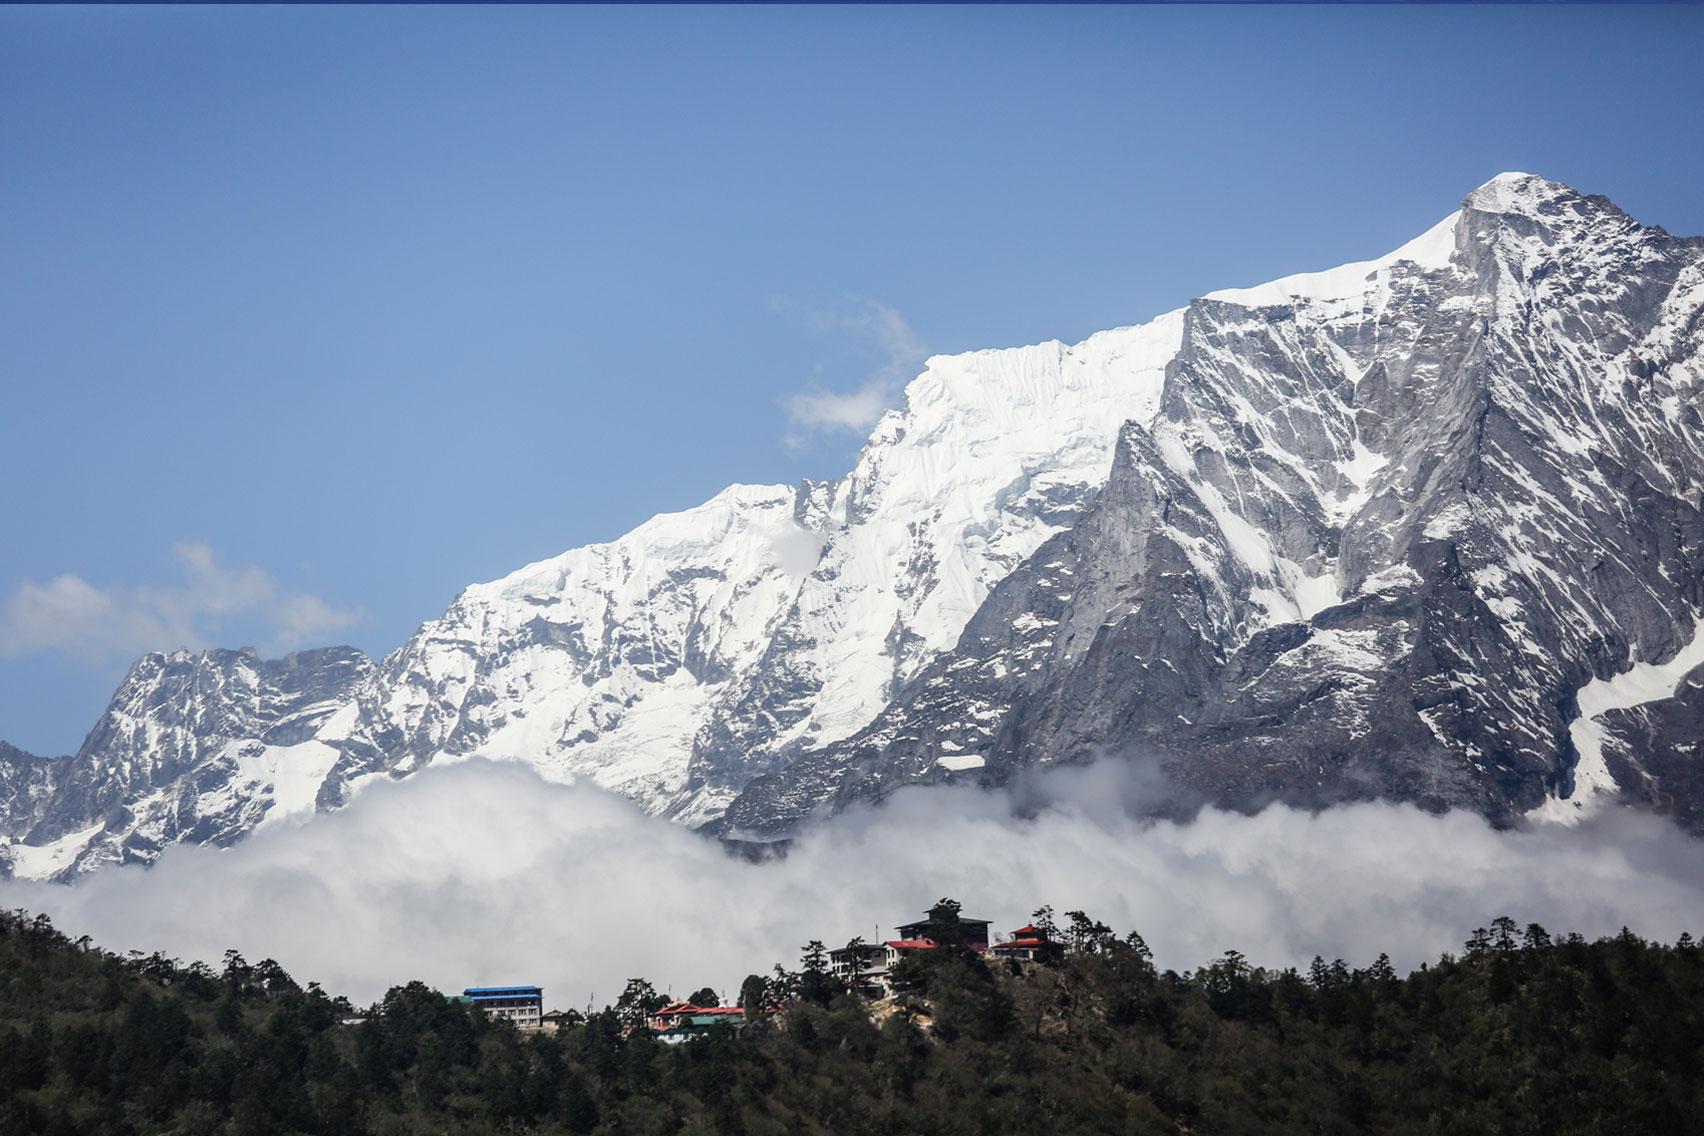 Day 6: Trek from Namche Bazaar (3445m) to Tengboche (6hrs, 3860m)